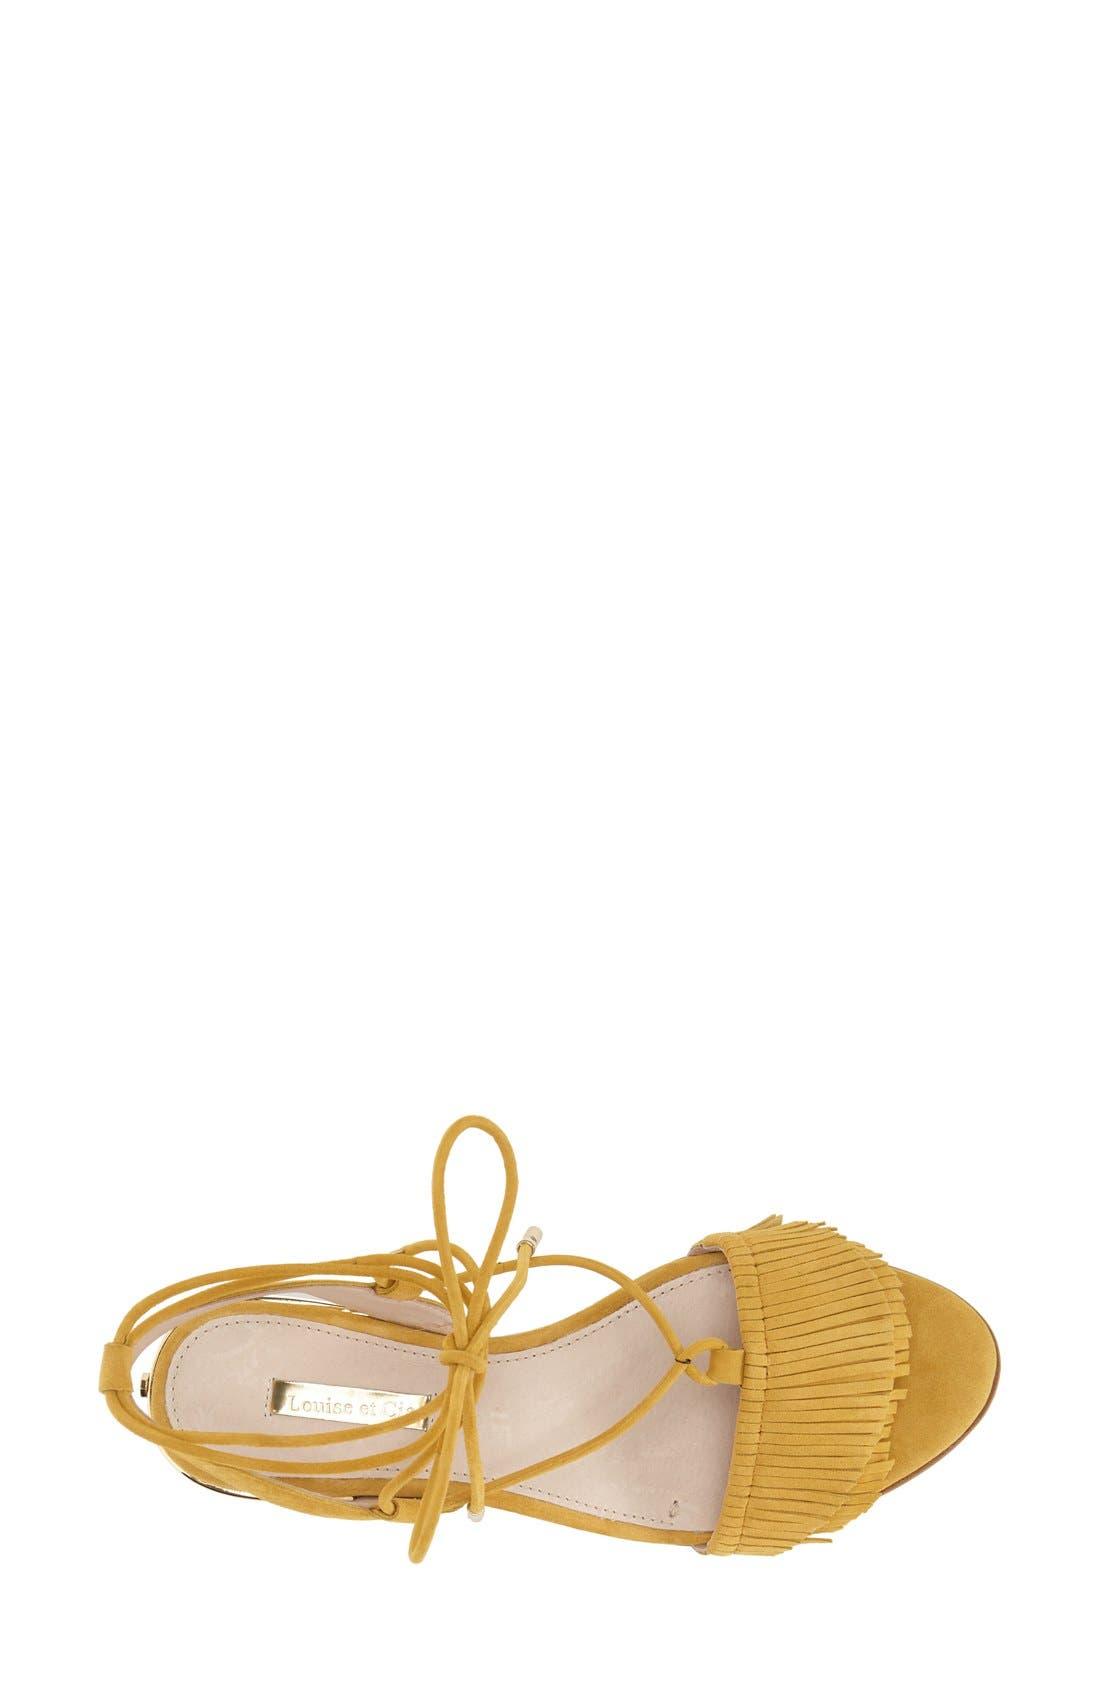 Alternate Image 3  - Louise et Cie 'Cyan' Fringe Sandal (Women)